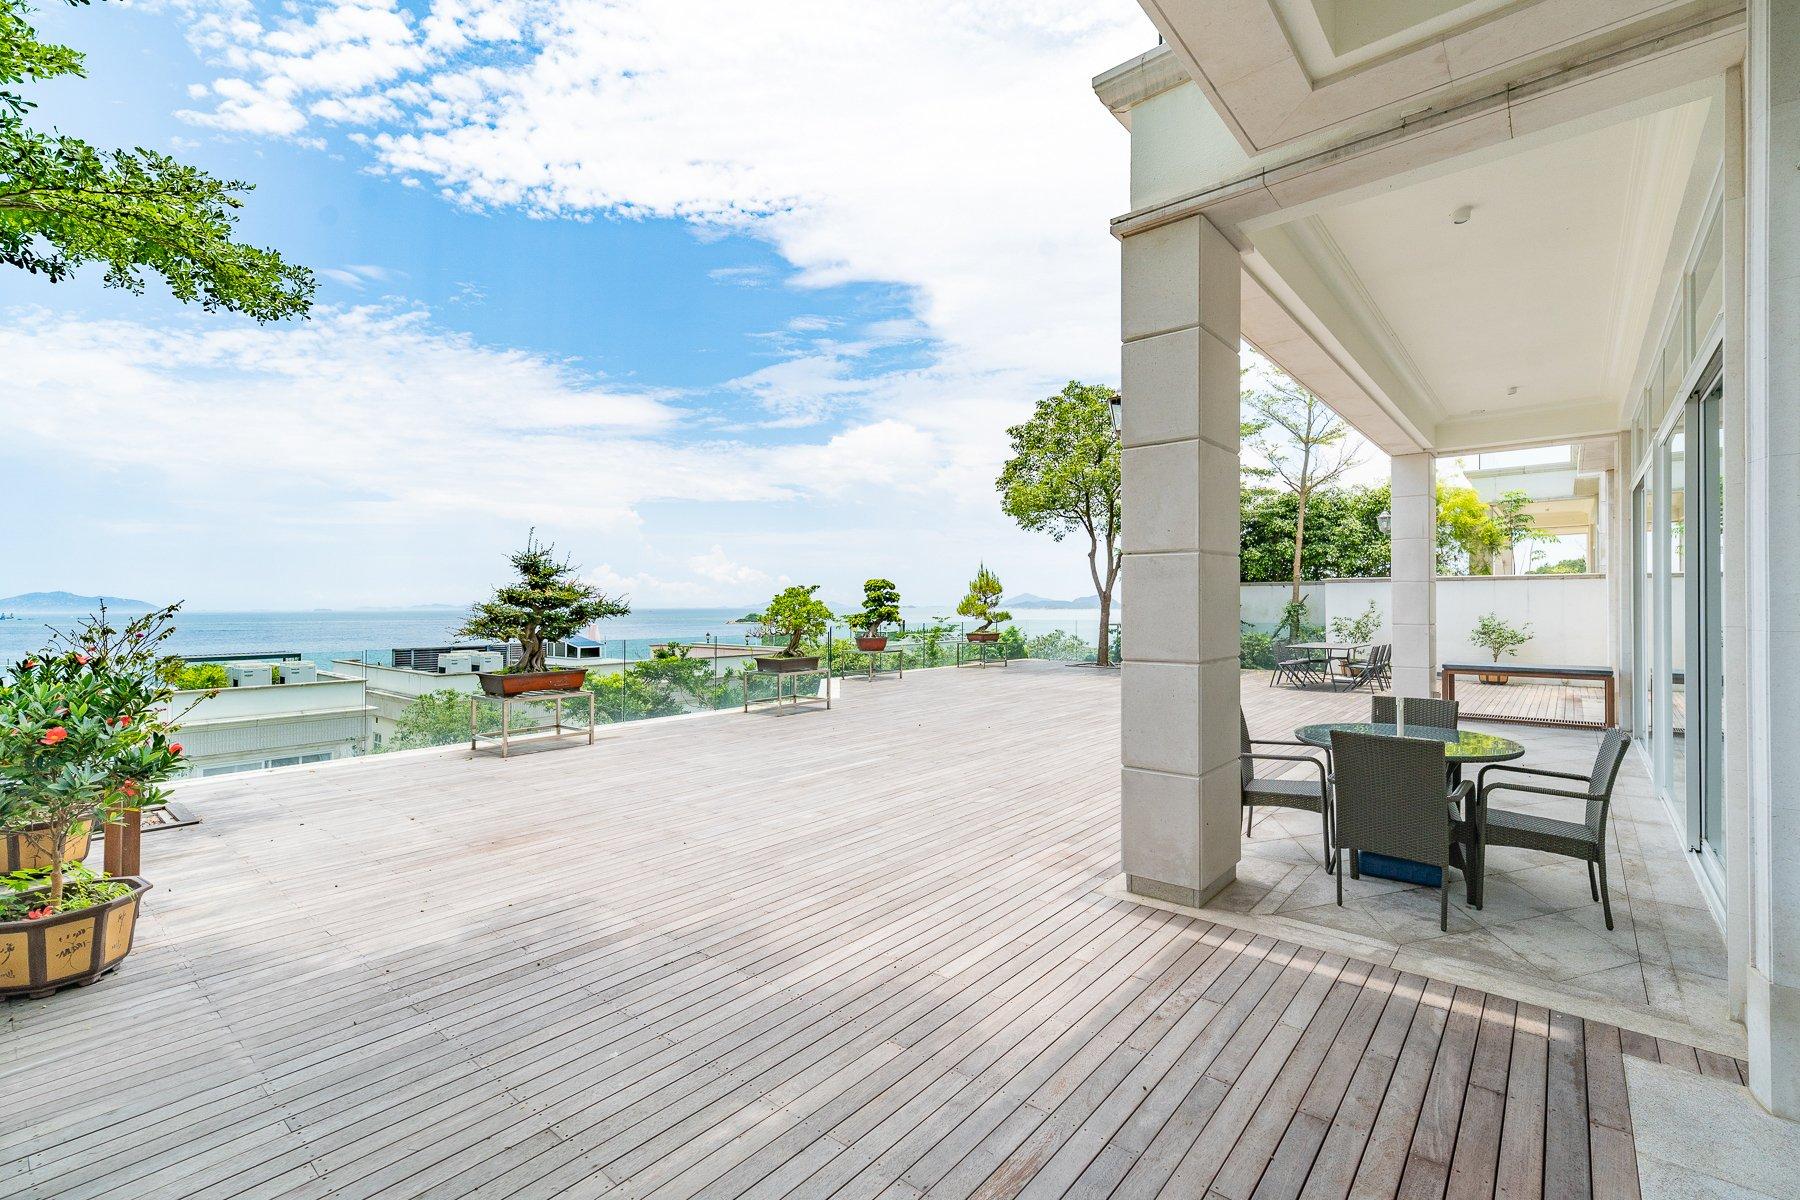 House in Lantau Island, New Territories, Hong Kong 1